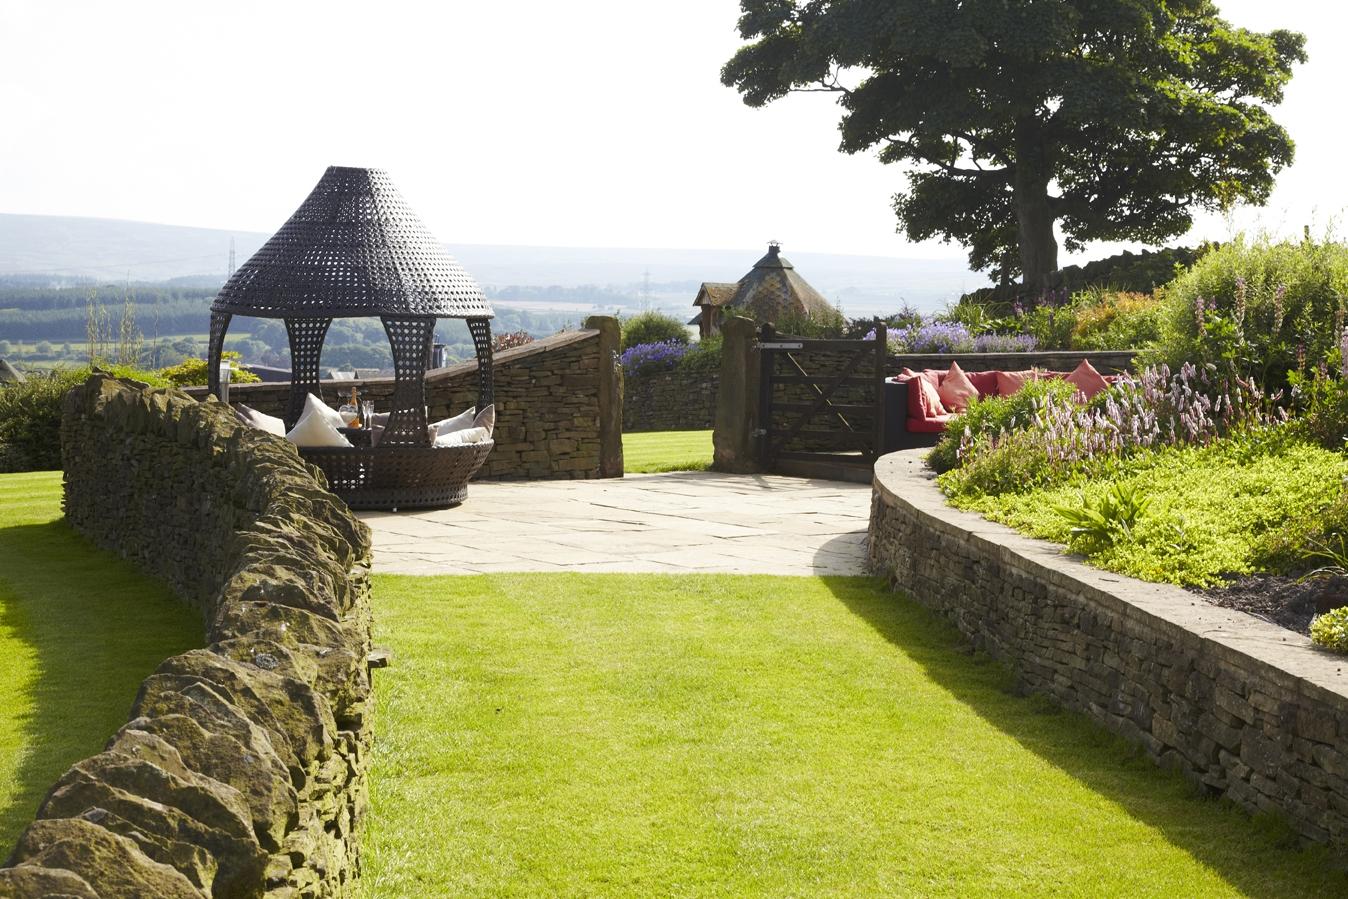 Spa Amp Gardens Smallshaw Farm Cottages Luxury Barn